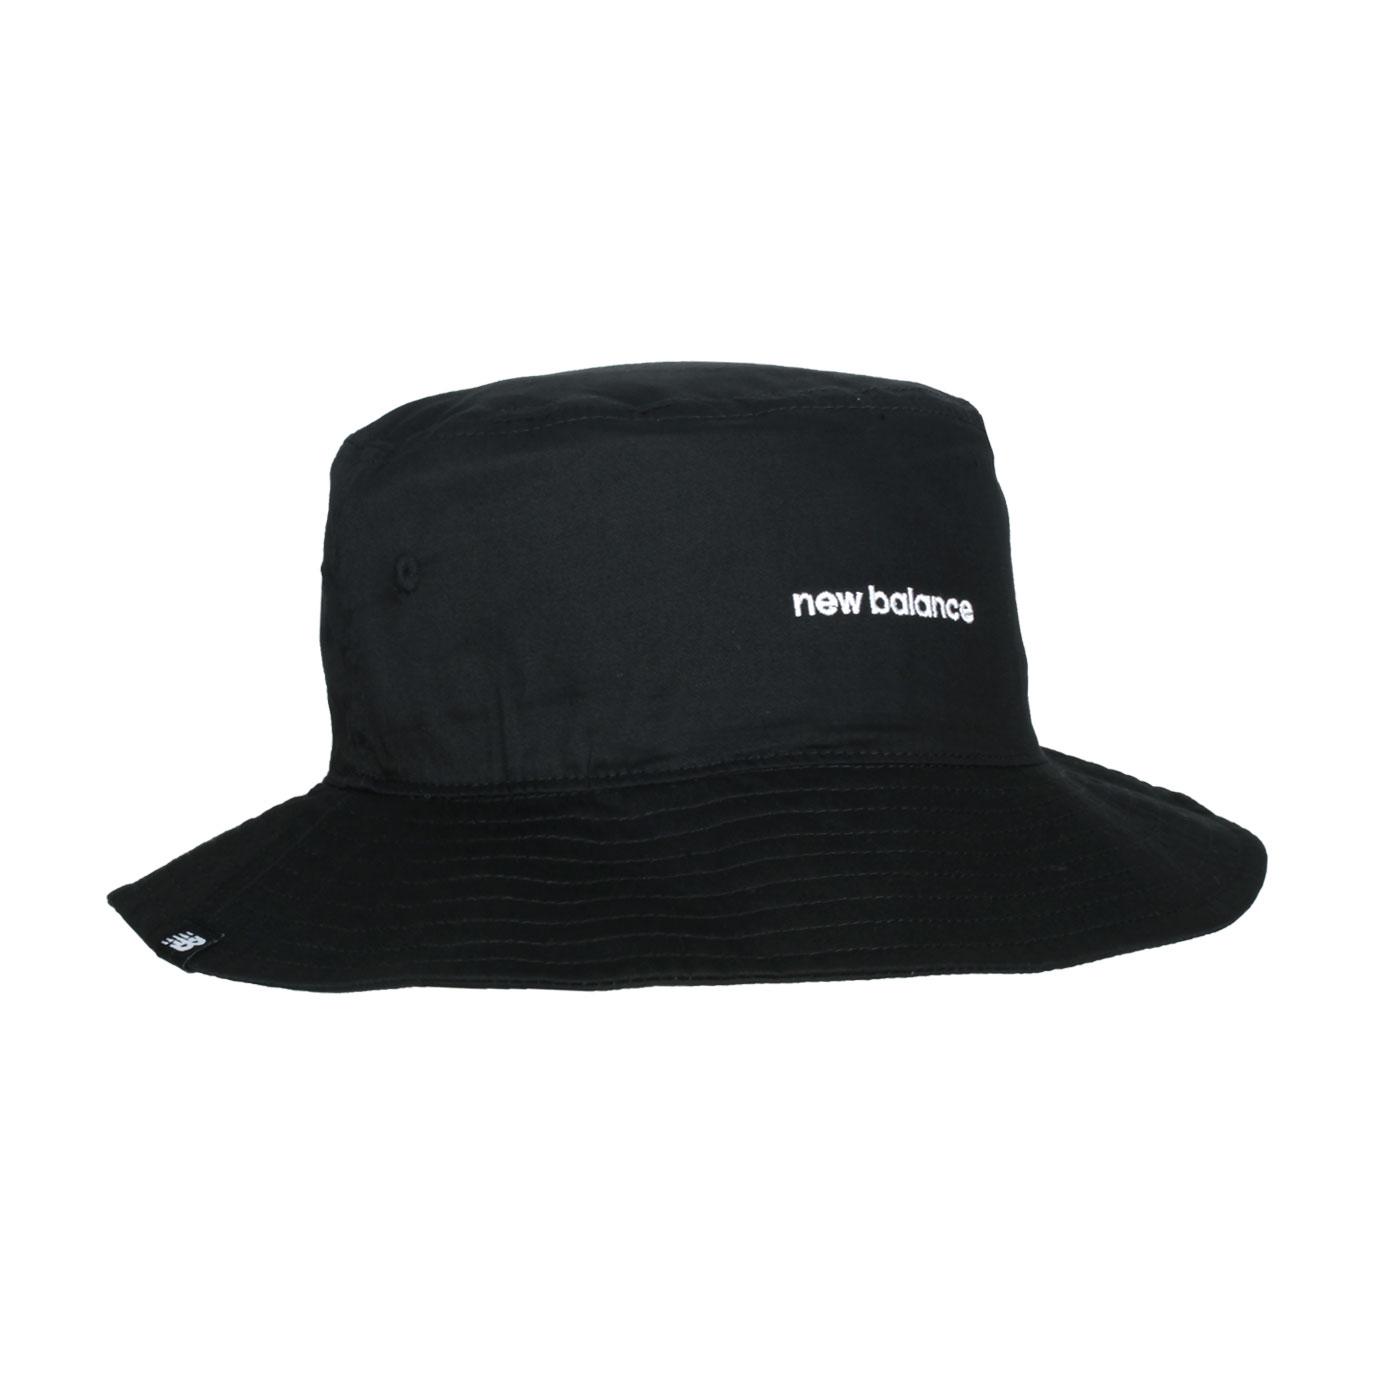 NEW BALANCE 漁夫帽 LAH13003BK - 黑白